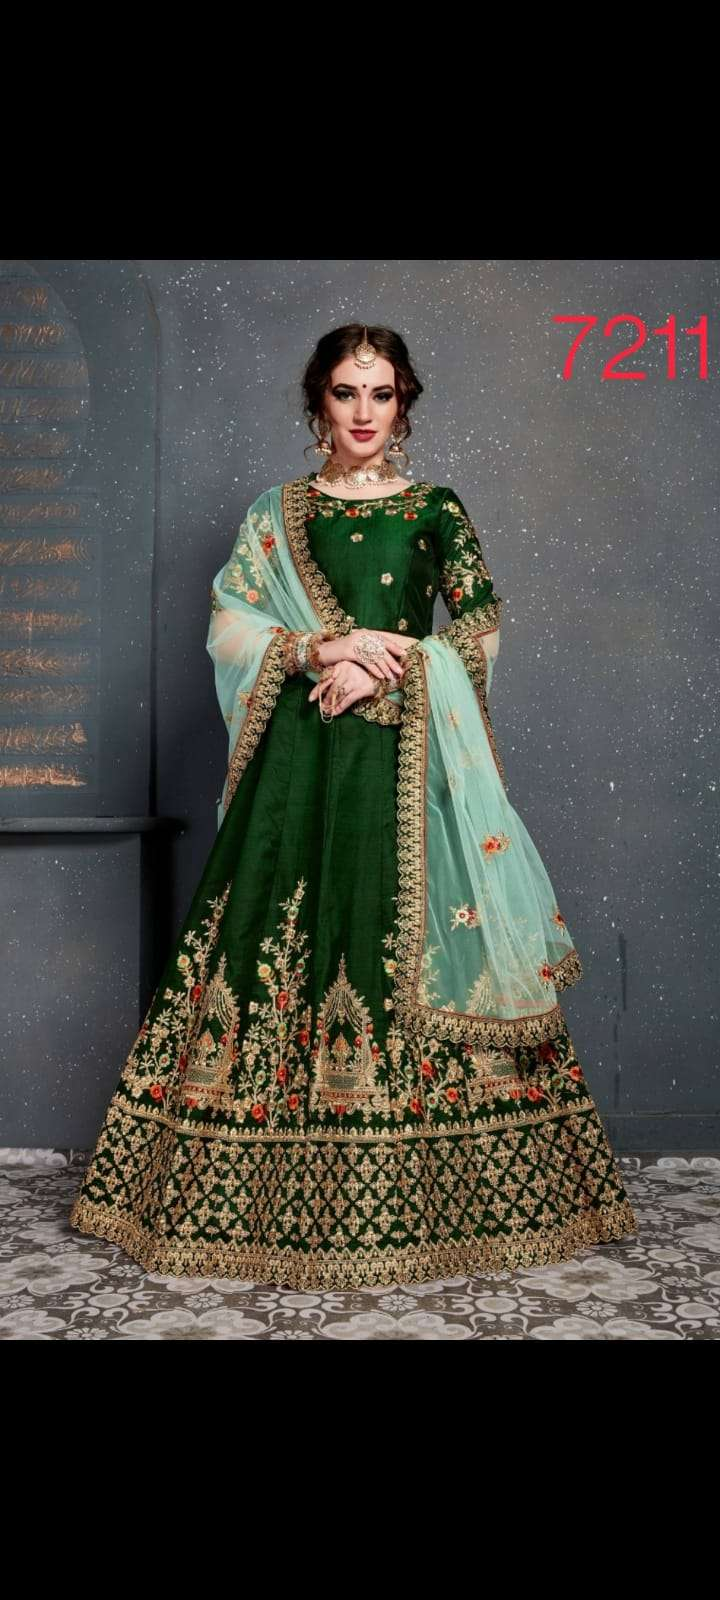 ZC CLOTHING ROOHBAB VELVET DESIGNER WEDDING WEAR LEHENGA CHOLI